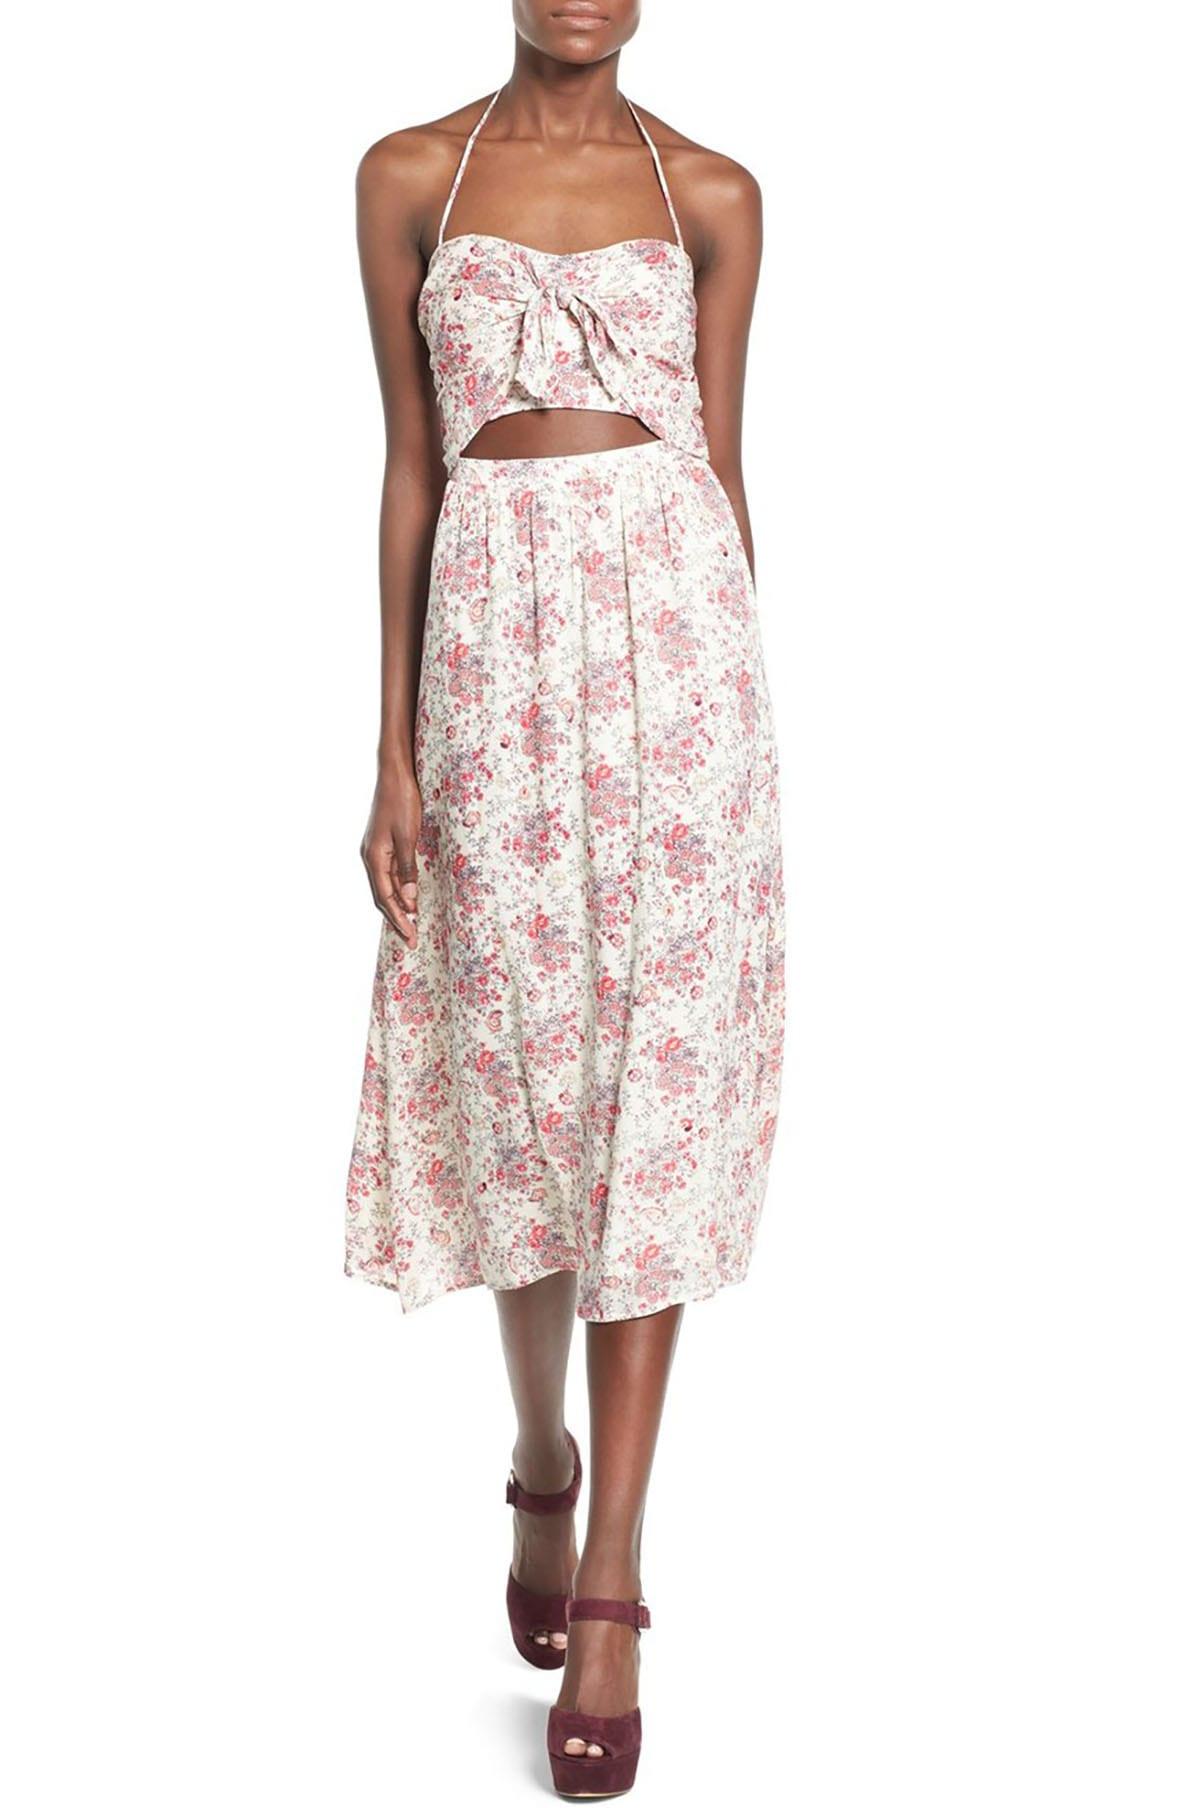 2f9d3b8be279 Poor Little It Girl - The Best Dresses at Nordstrom - @poorlilitgirl